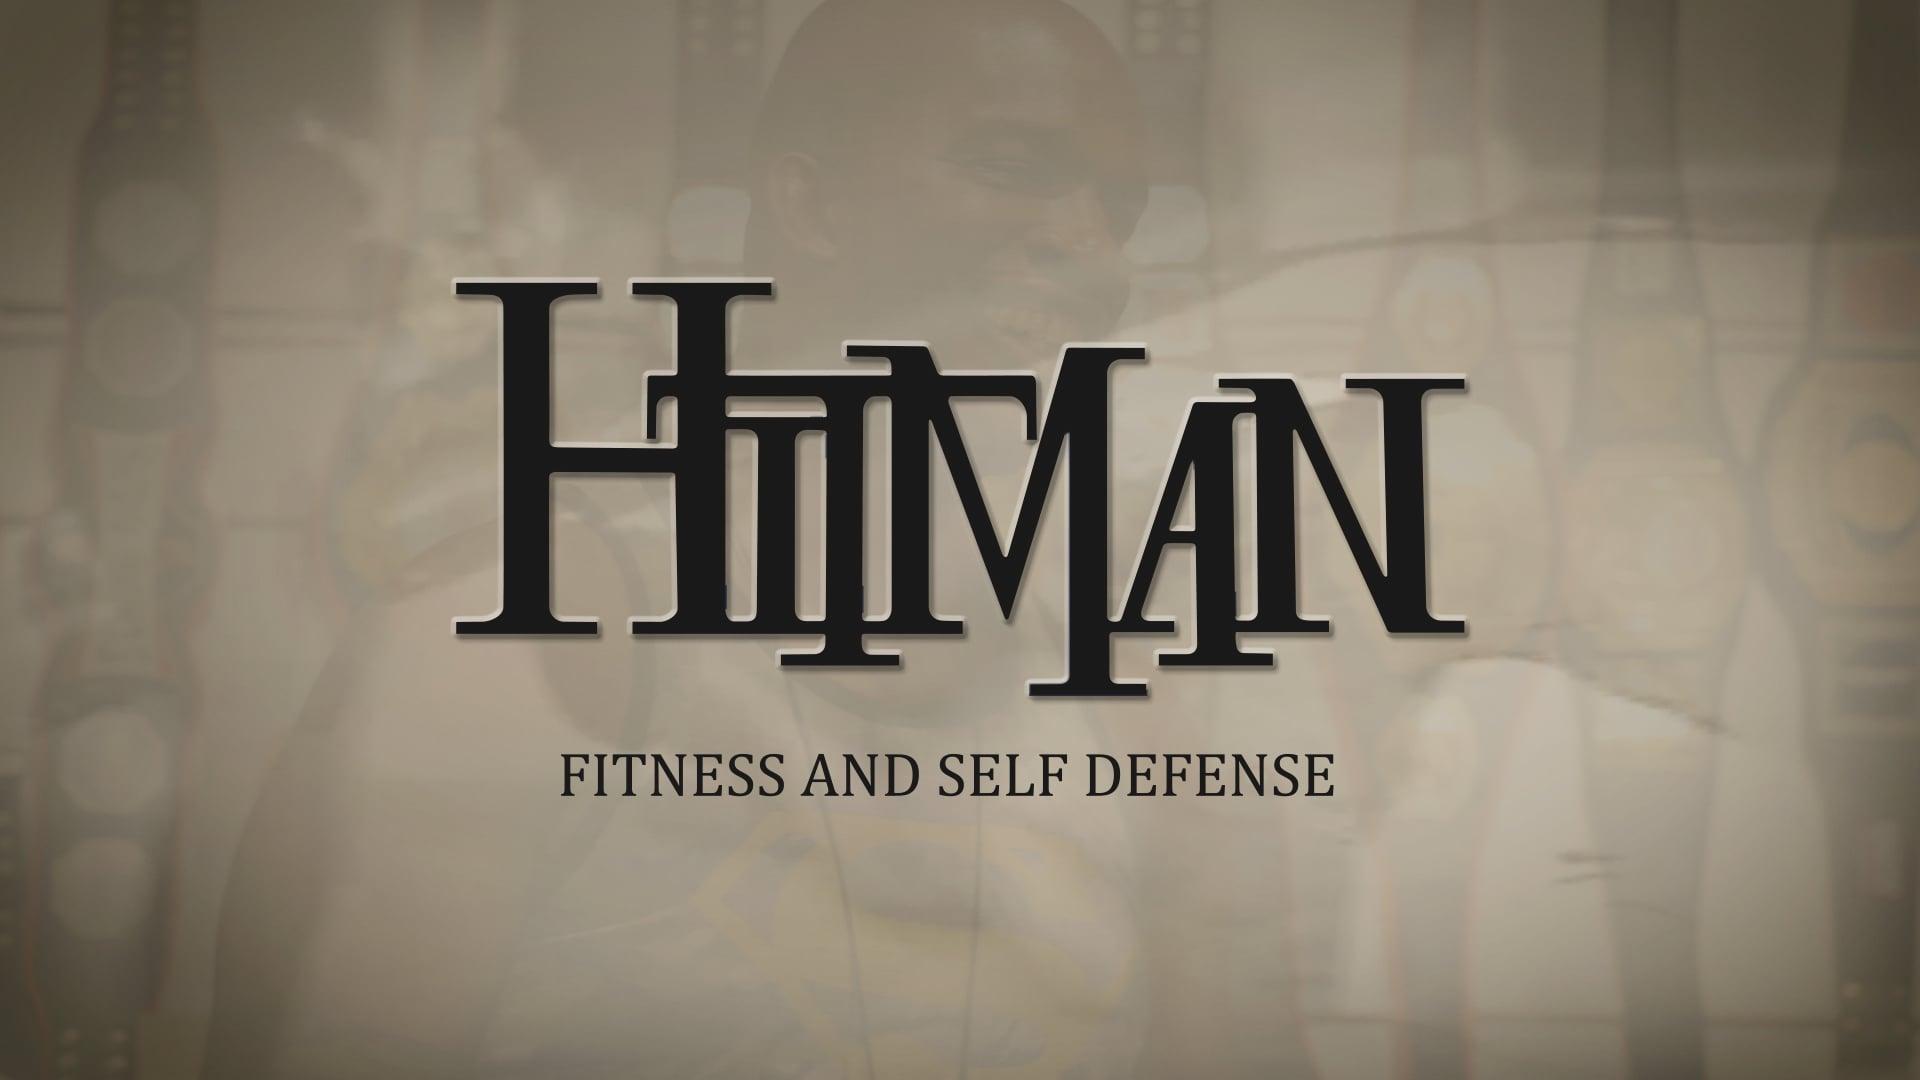 Hitman Fitness and Self-Defense